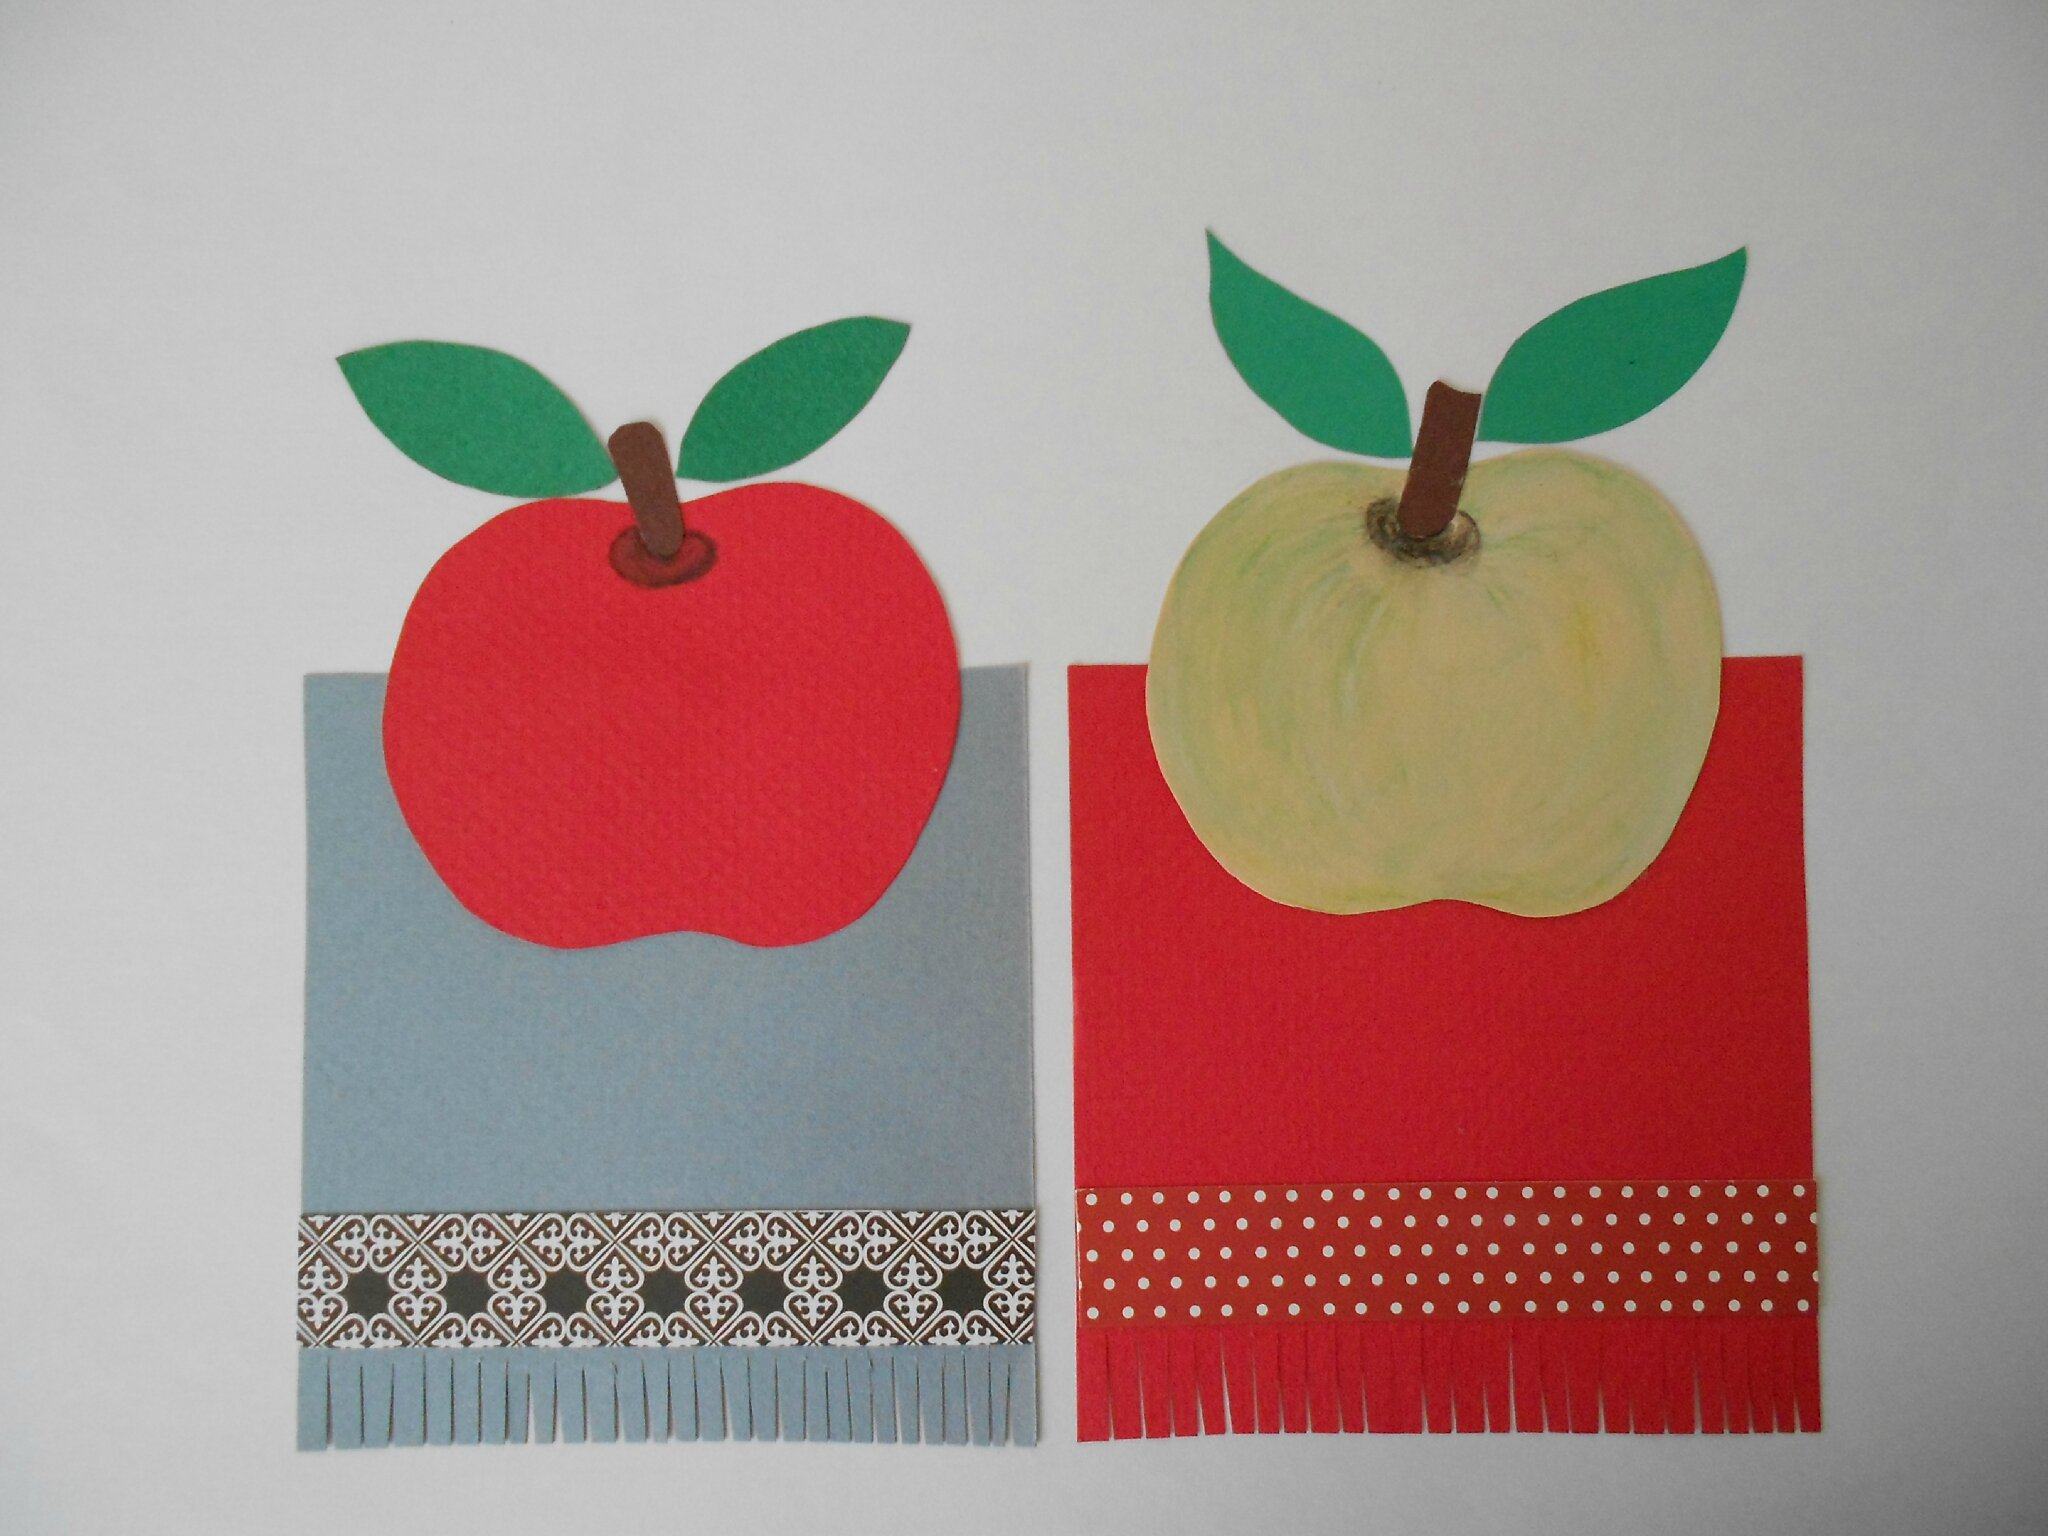 pomme de reinette et pomme d 39 api le blog de thali. Black Bedroom Furniture Sets. Home Design Ideas